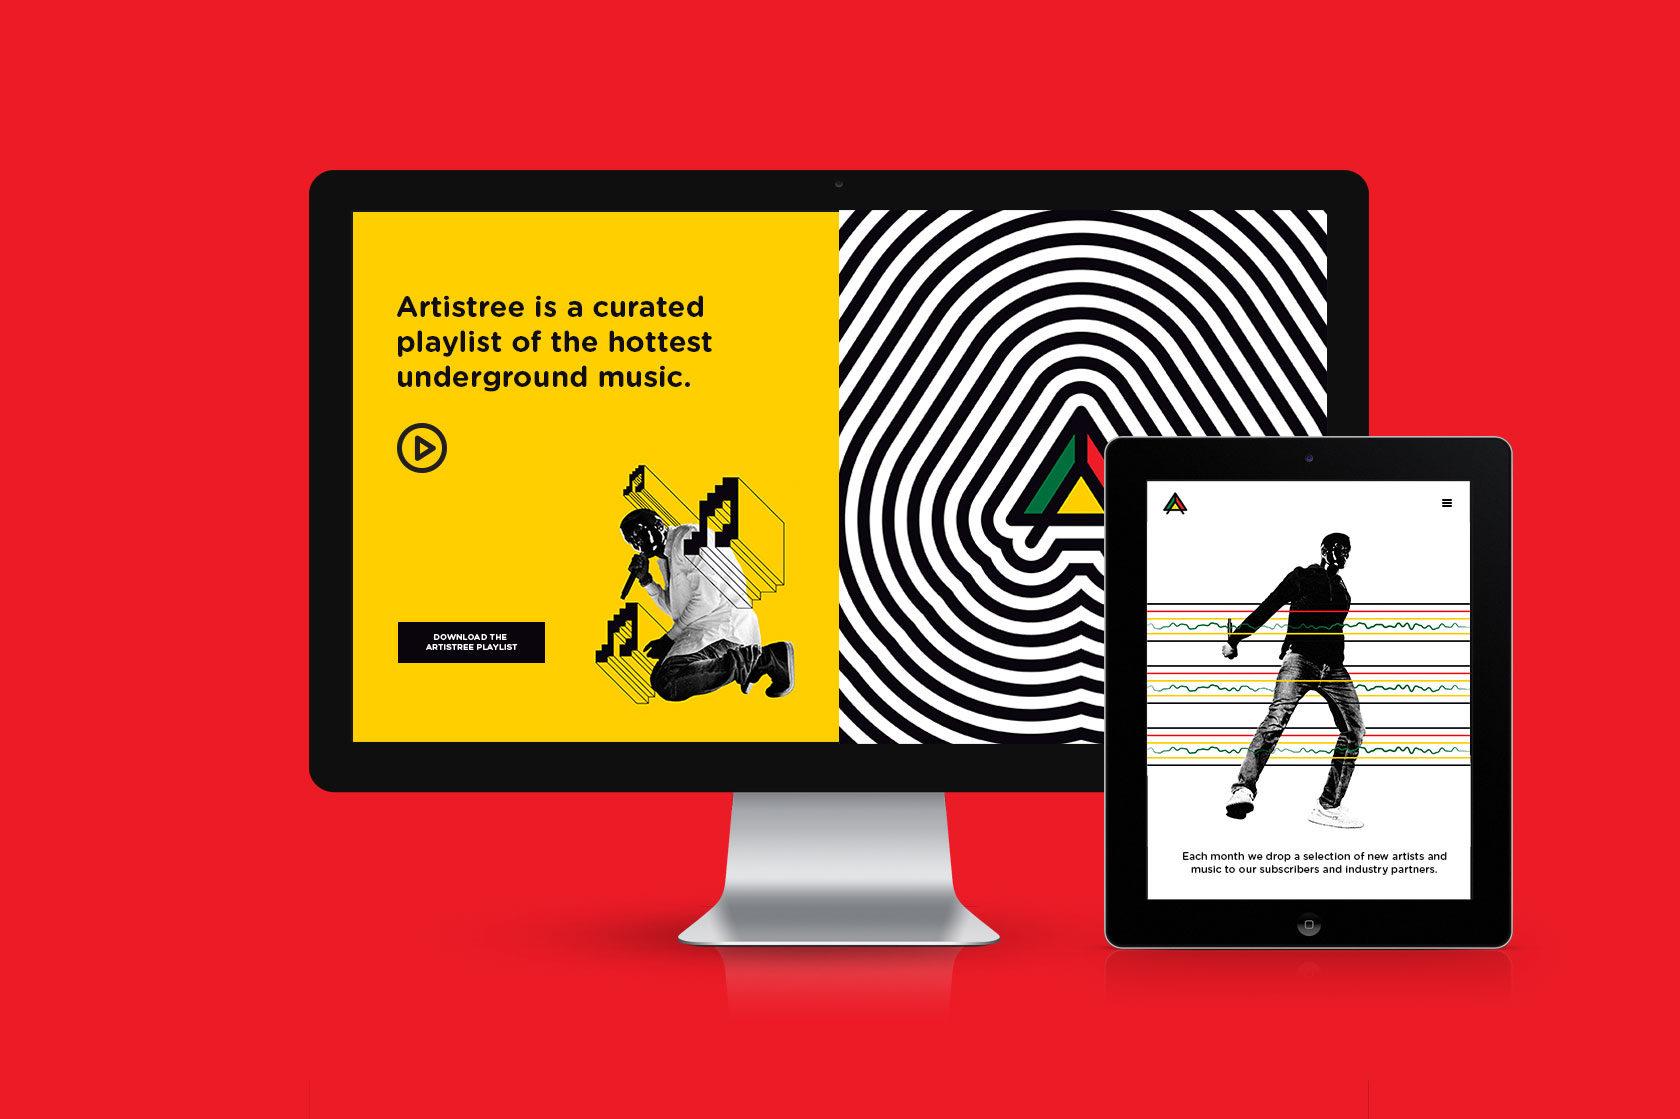 Artistree-website-design-by-Furia